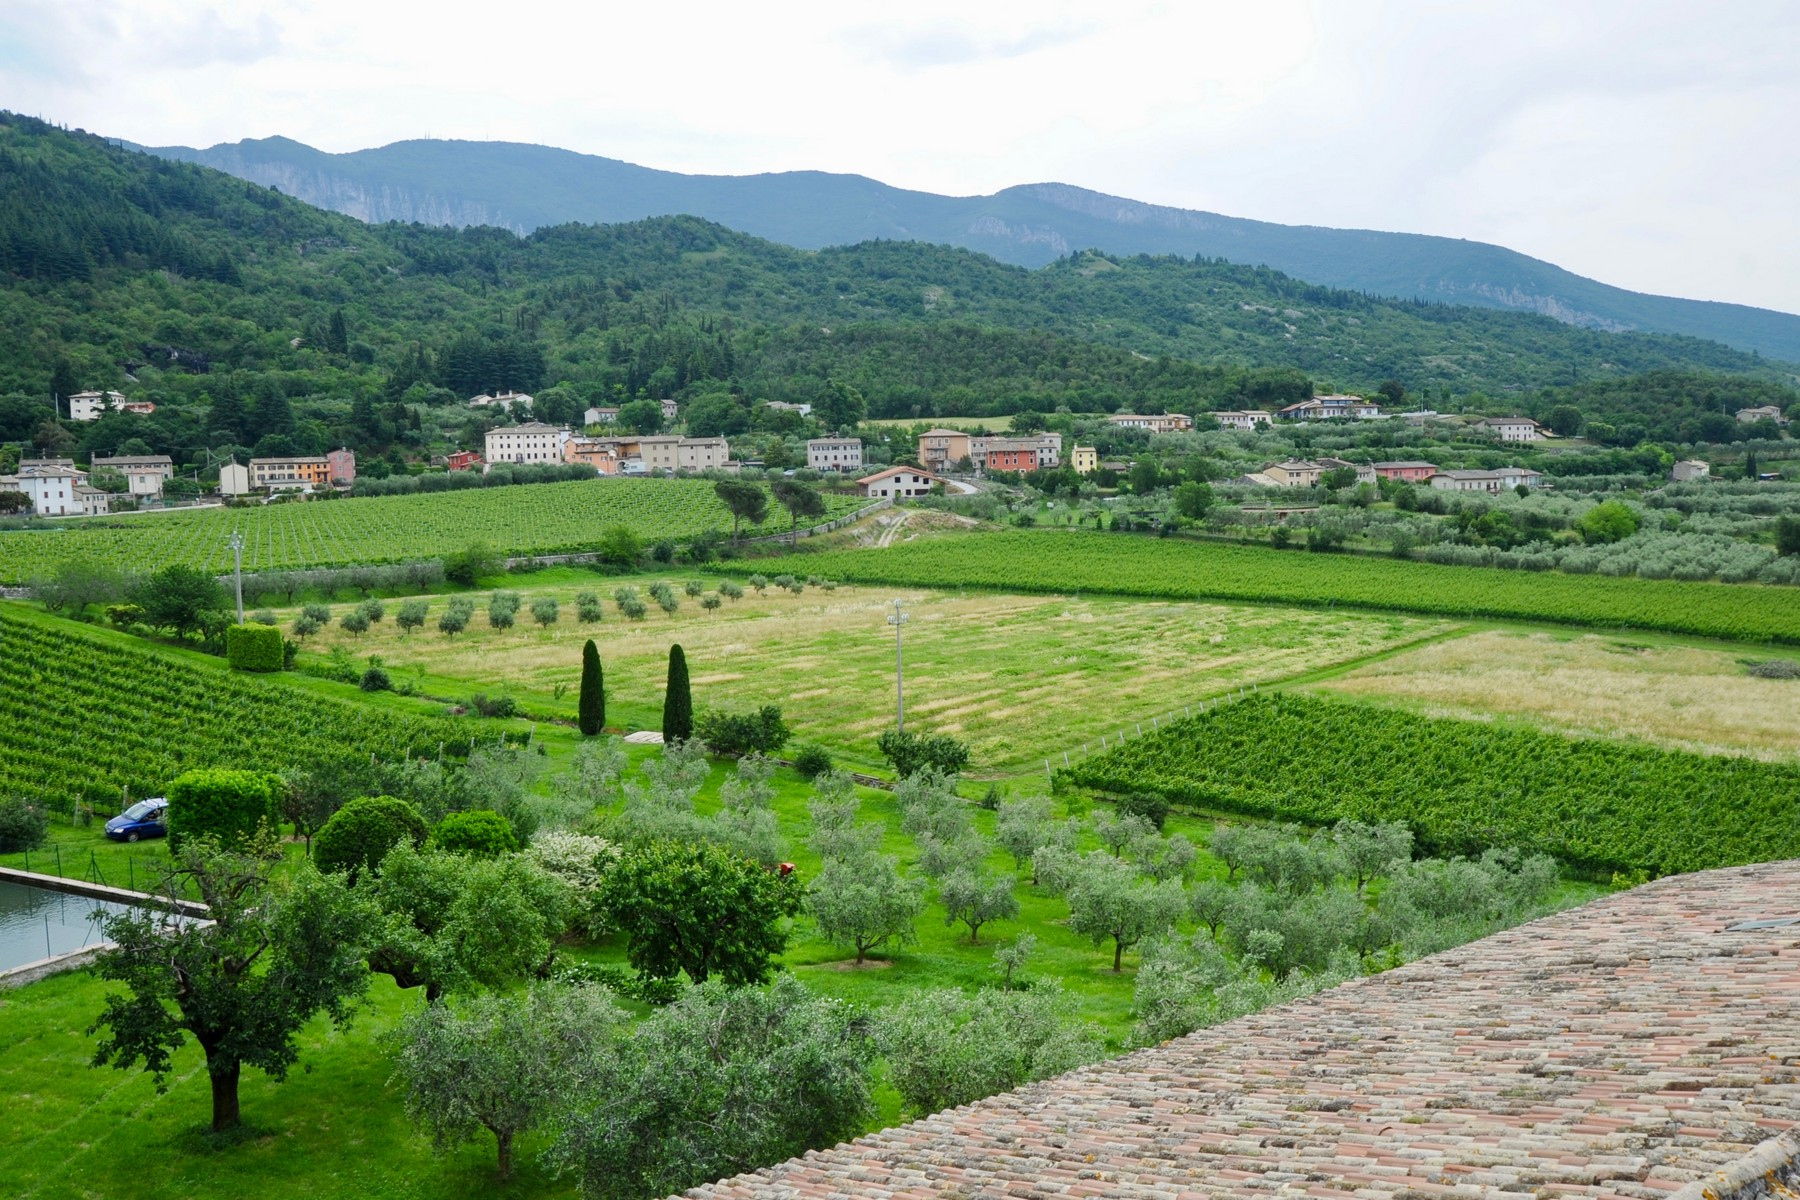 Villa in Vendita a Verona: 5 locali, 450 mq - Foto 12